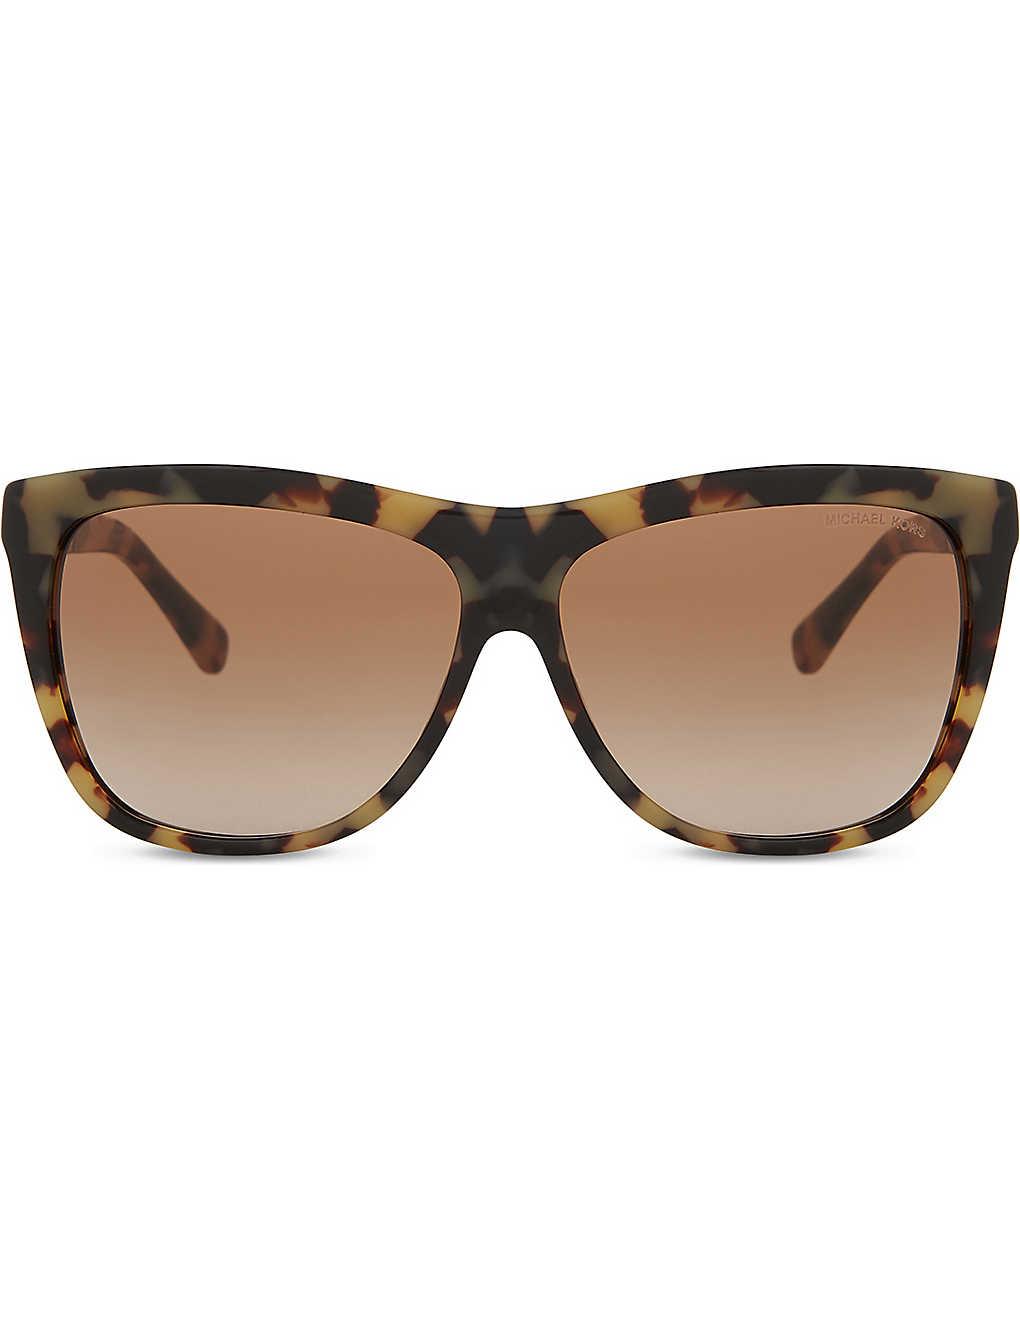 e442e156af MICHAEL KORS - MK6010 Benidorm 301313 vintage tortoiseshell square ...